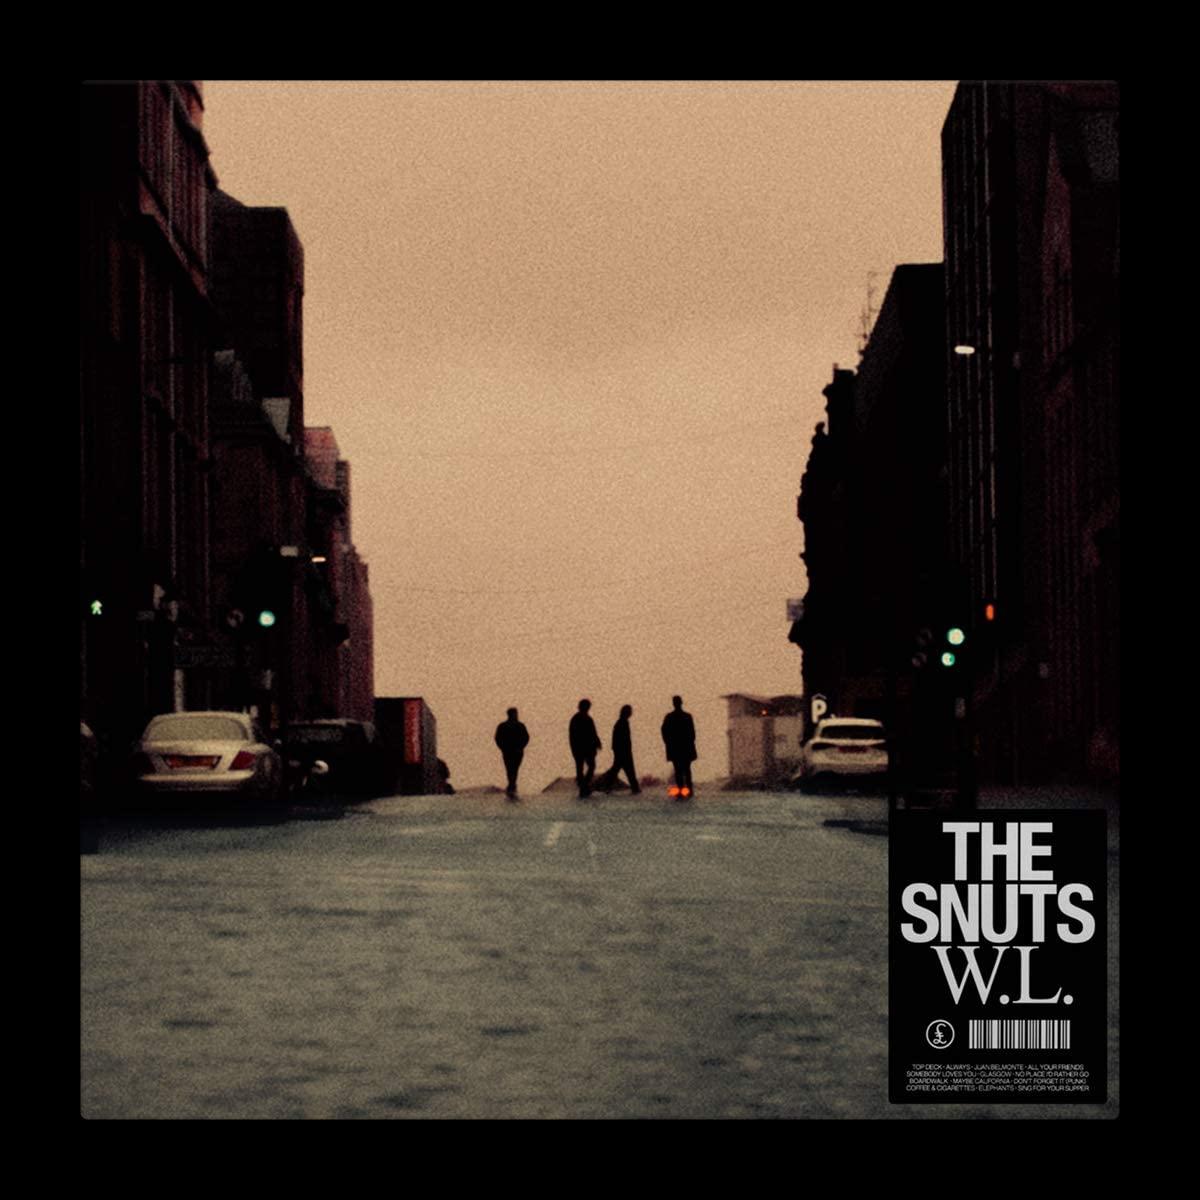 The Snuts - W.L. Limited Edition Brick Red Vinyl